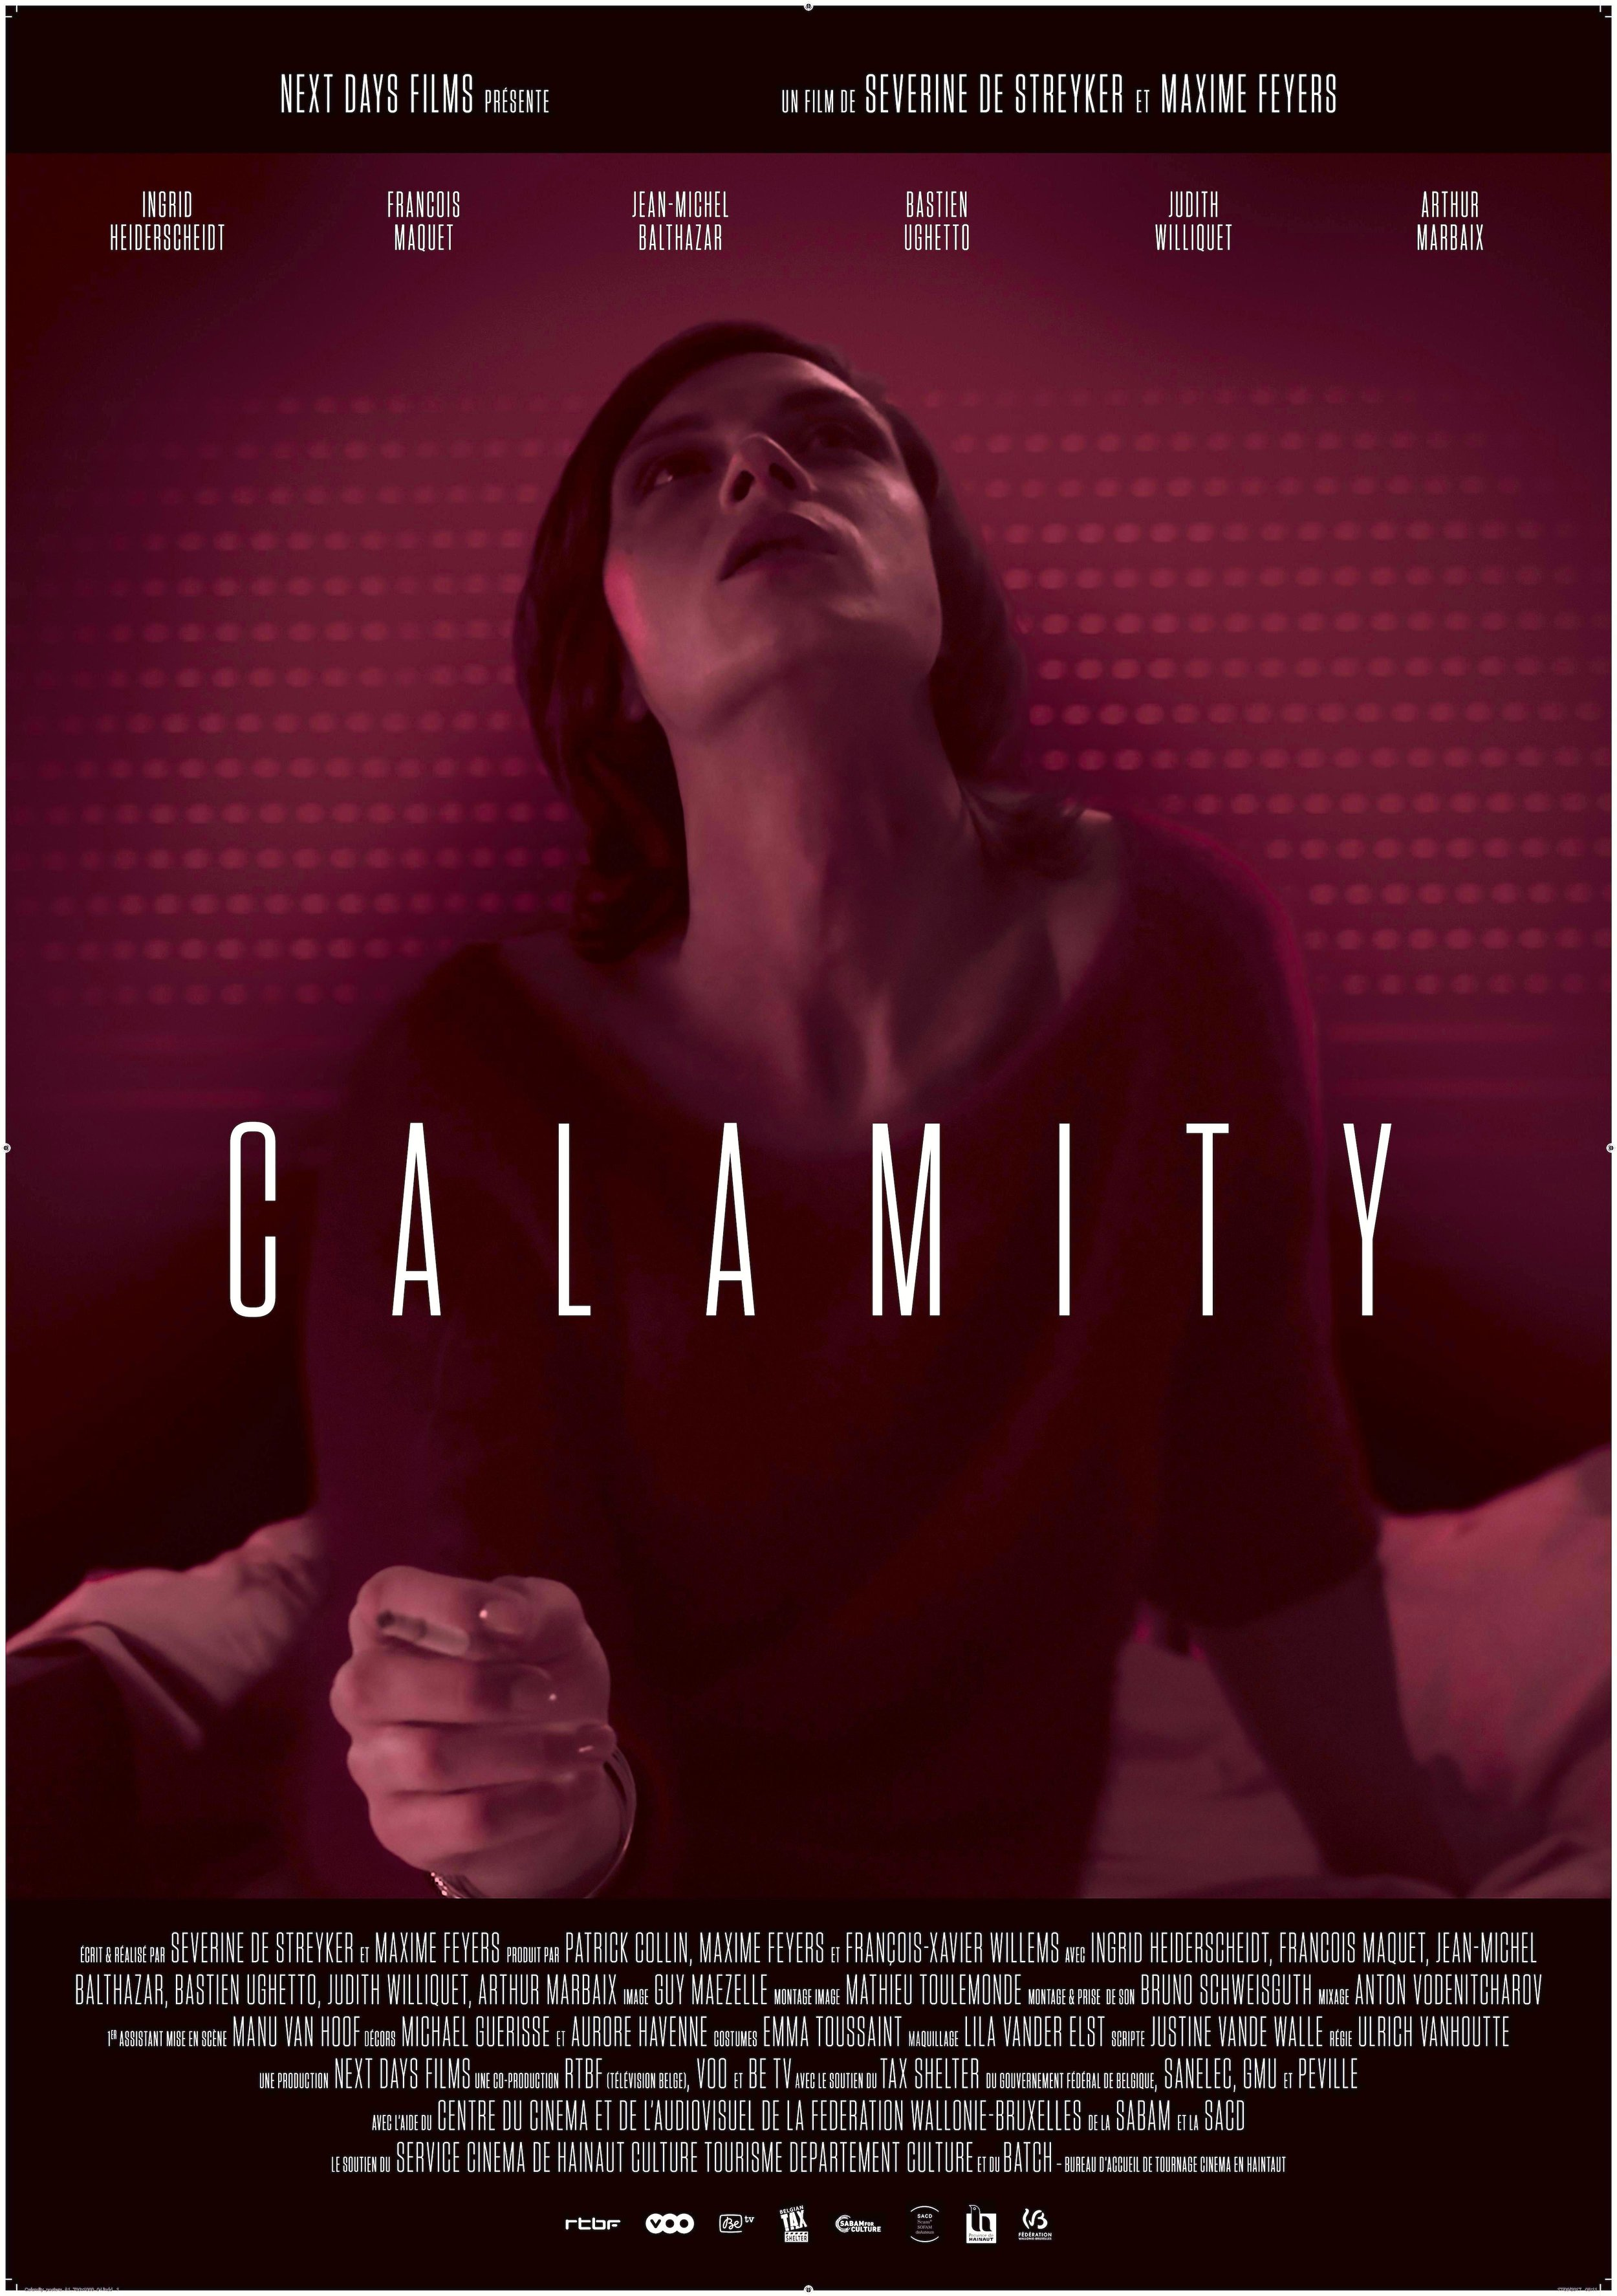 Calamity_Poster lighter.jpg